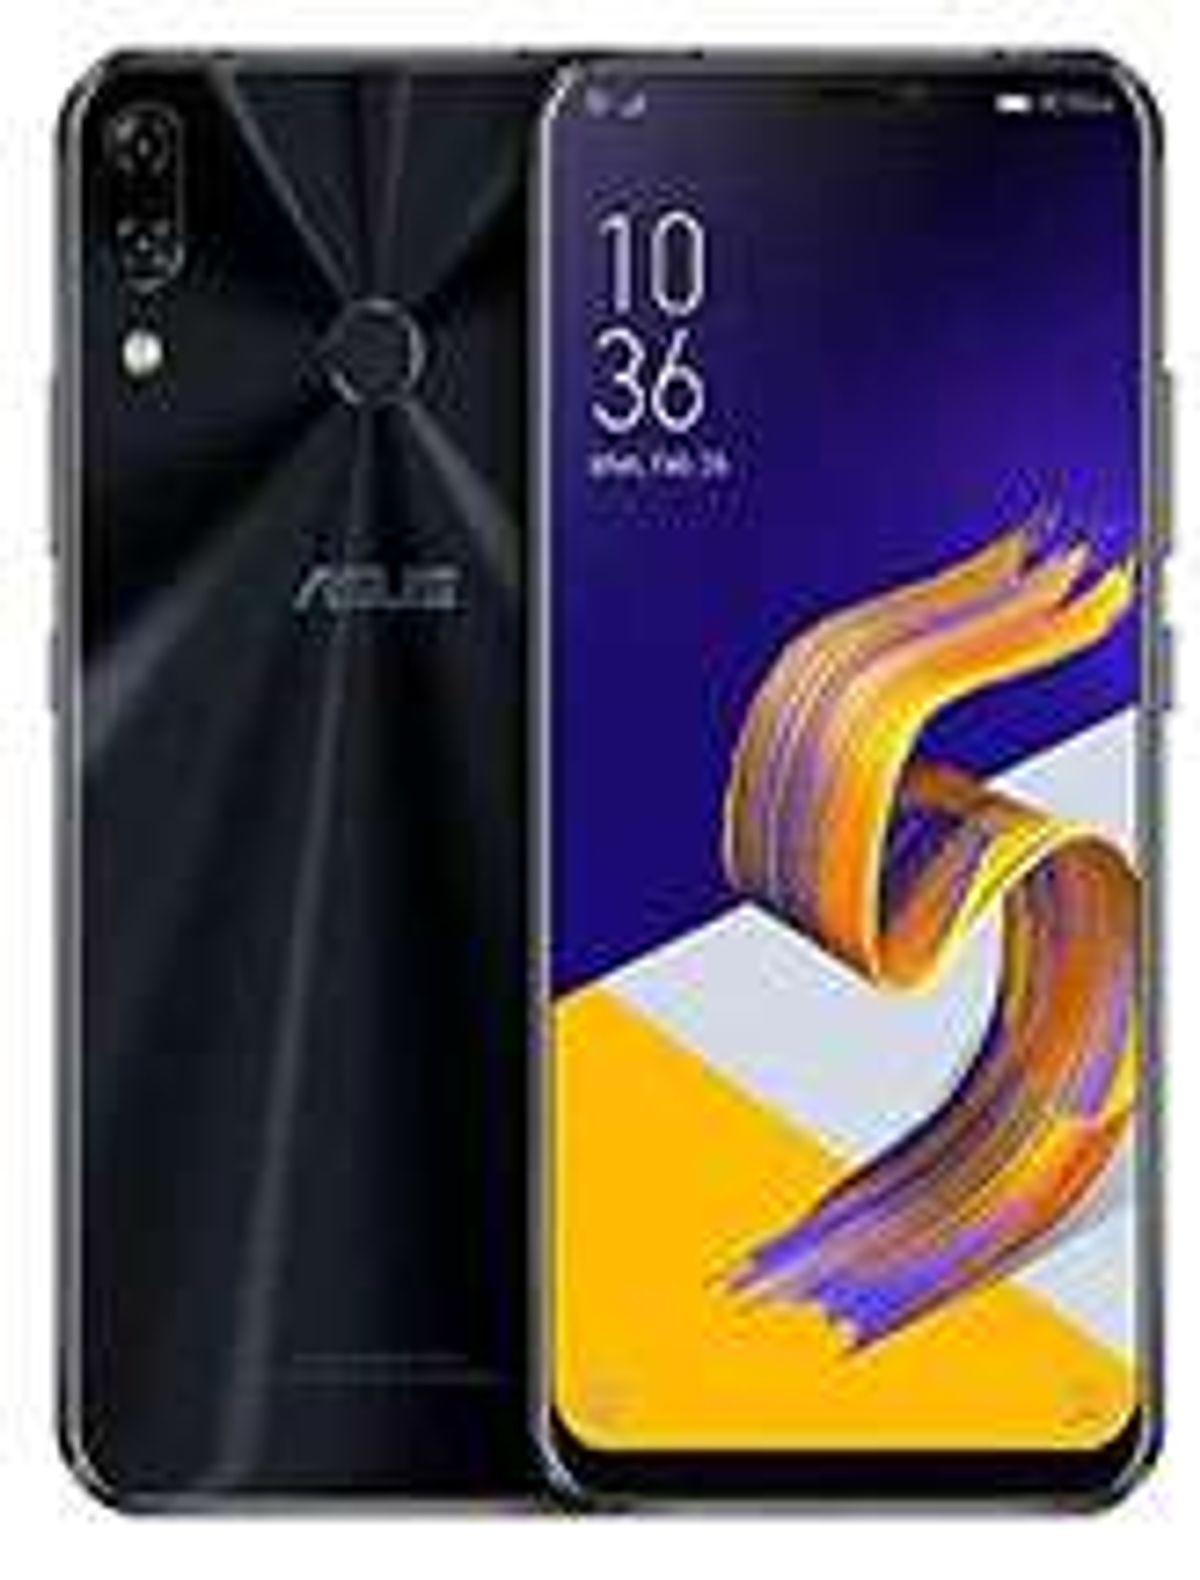 Best Mobile Phones Under 40000 in India - August 2019 | Digit in